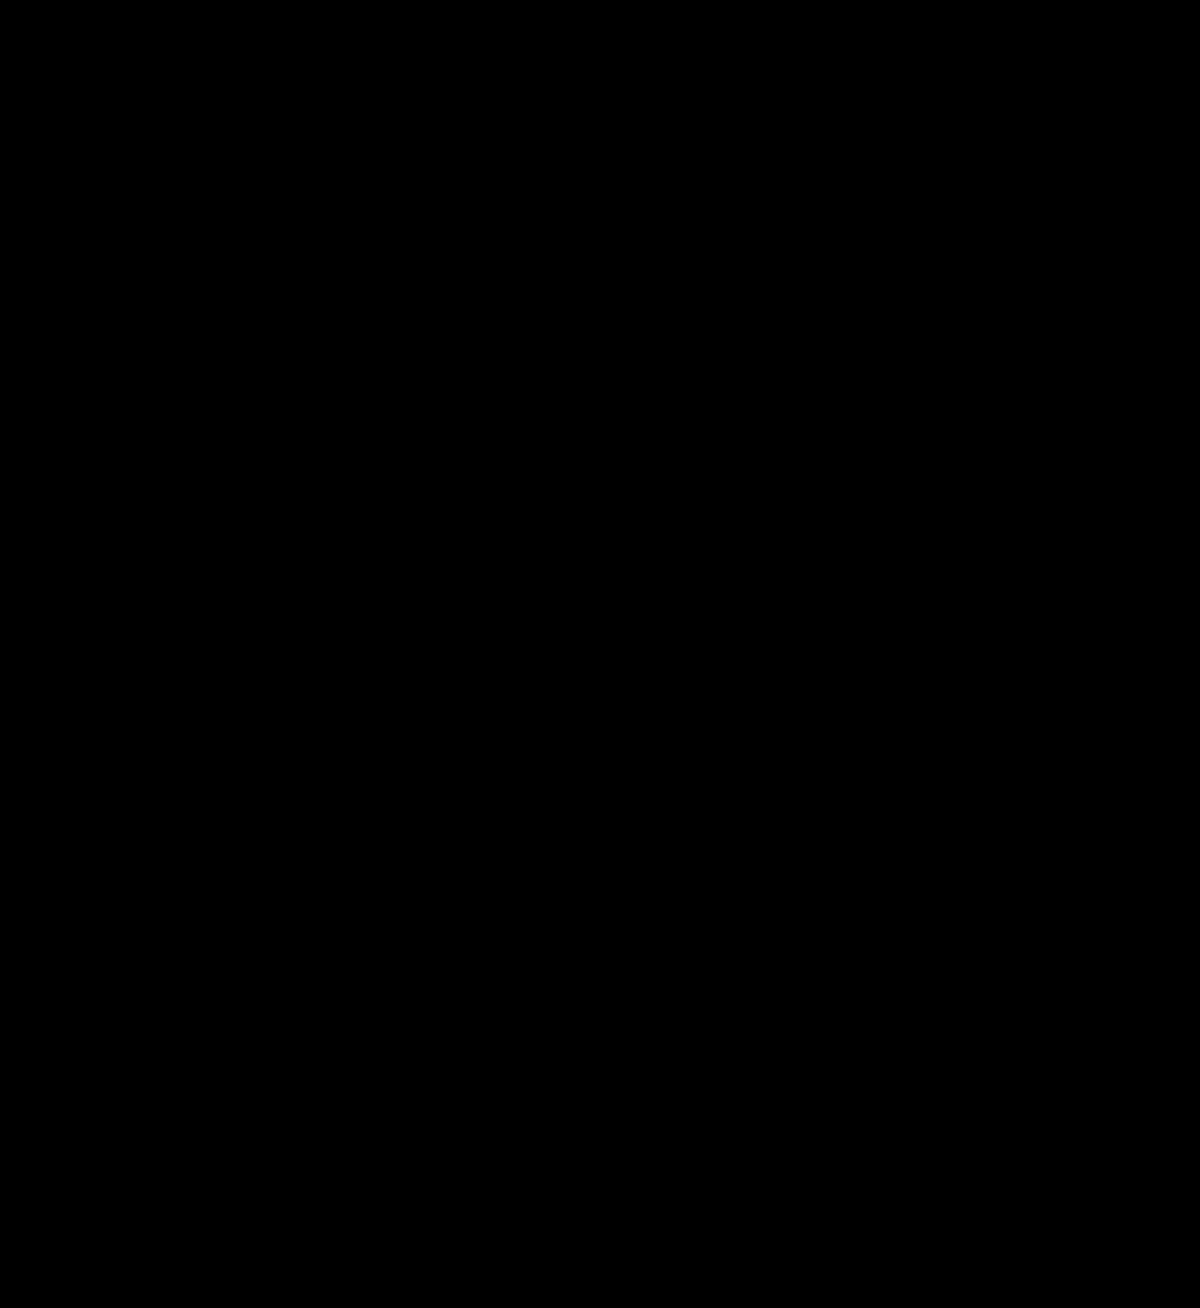 formula-salitsilovoj-kisloty